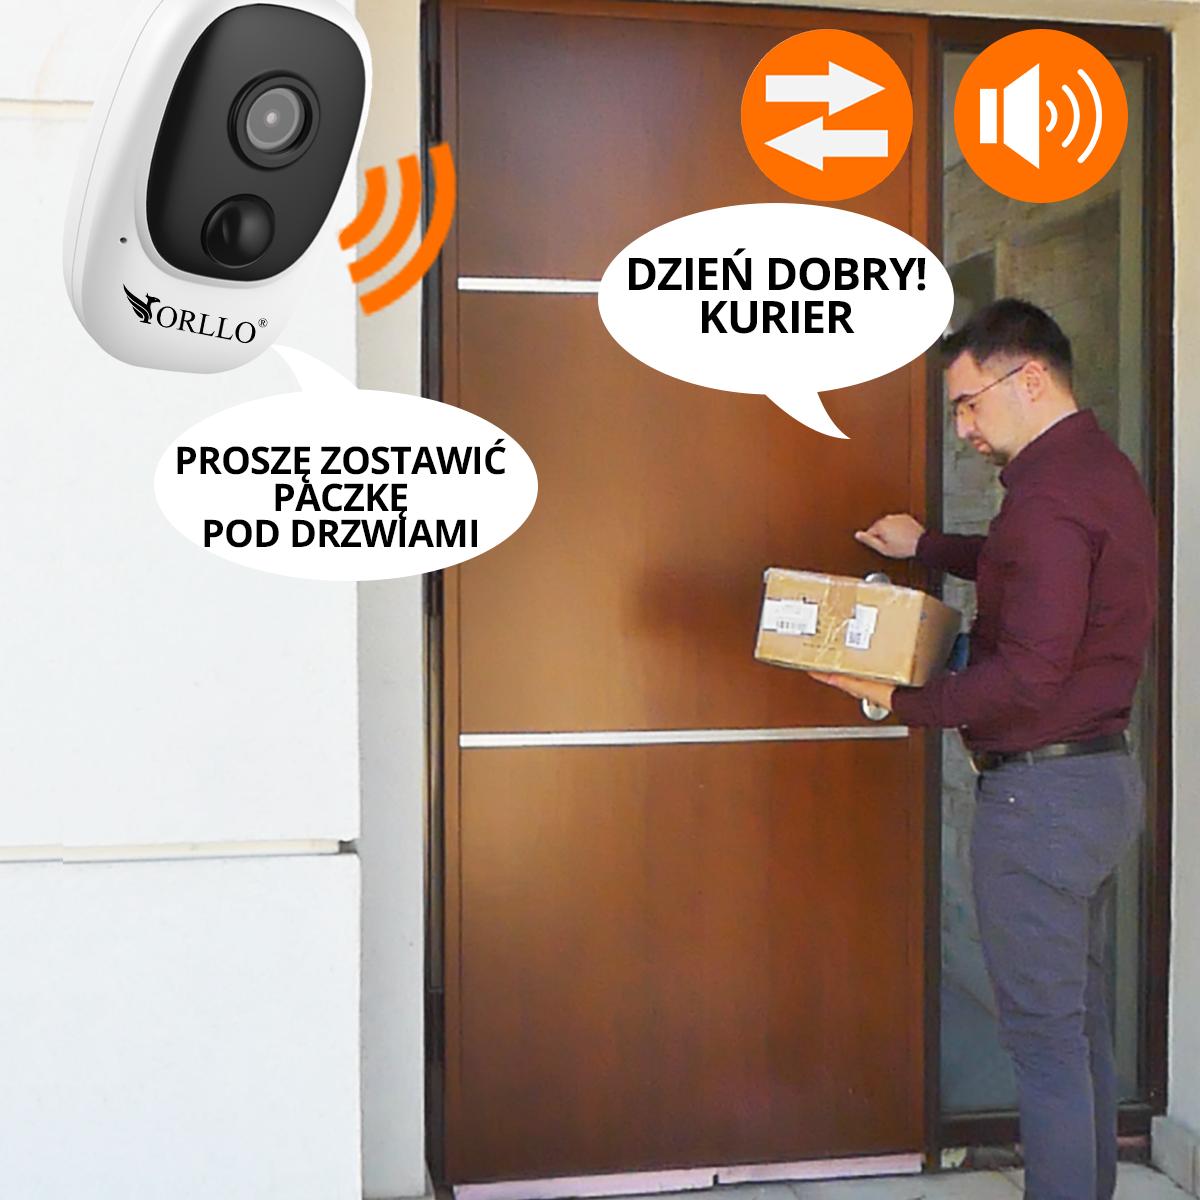 kamera na baterie wifi dwustronnakomunikacja orllo.pl